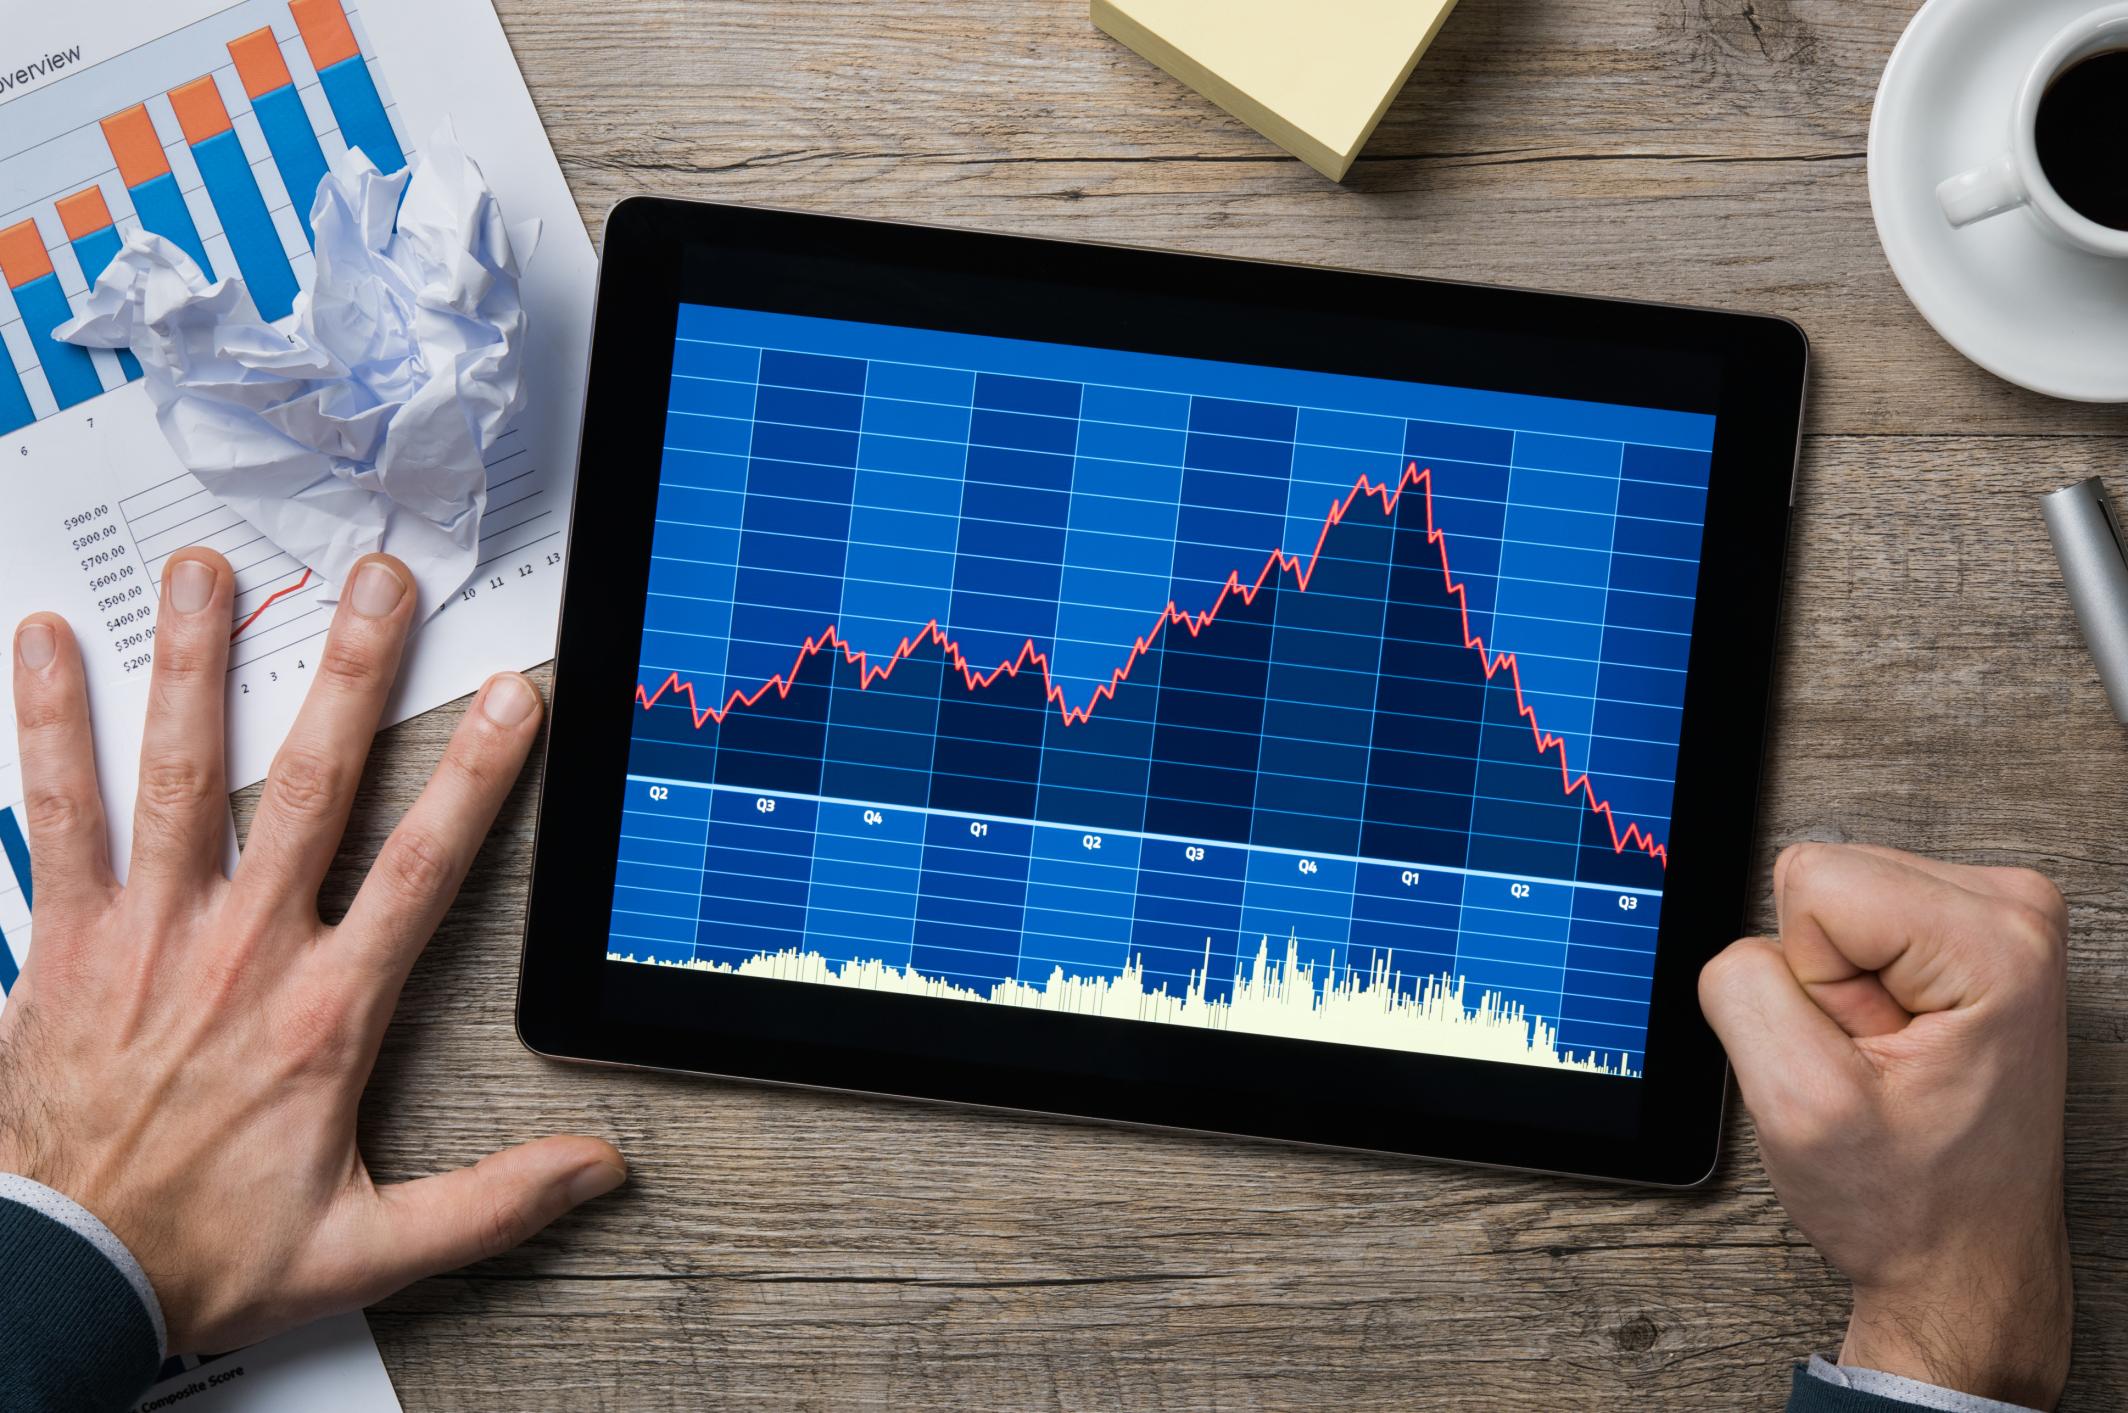 4 Moves to Make if the Stock Market Crashes Tomorrow